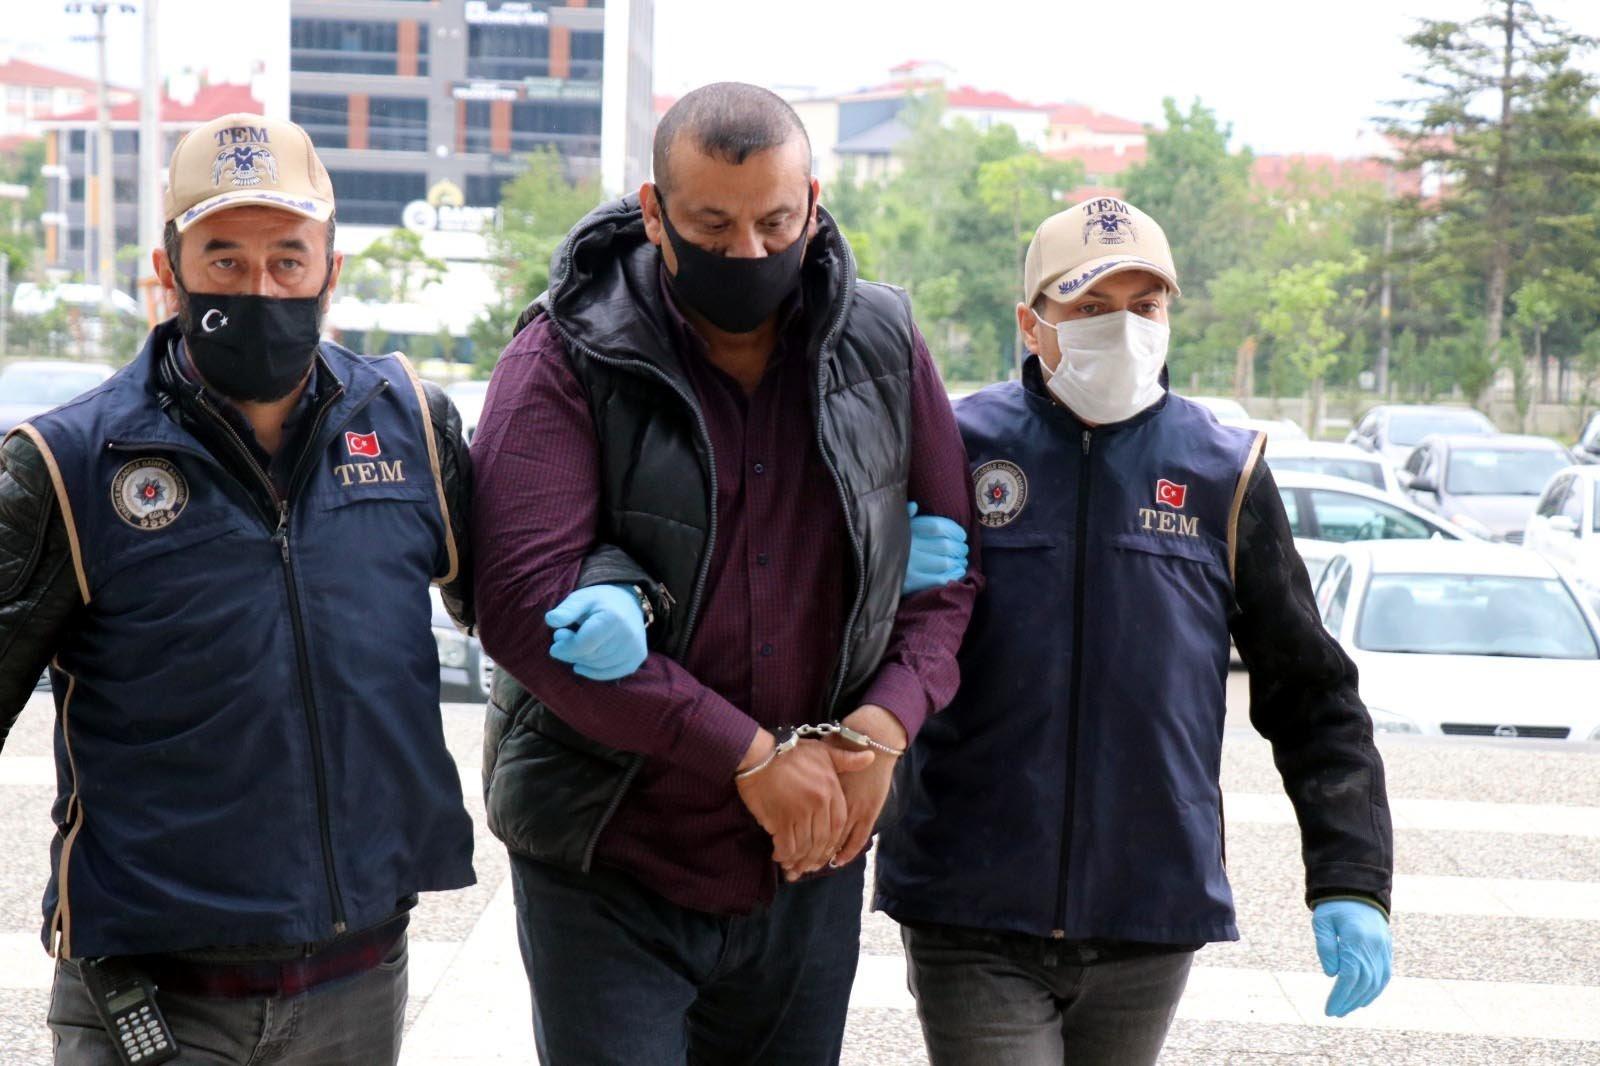 Police escort captured Daesh suspect Arkan Taha Ahmad (C), in Bolu, northern Turkey, June 4, 2021. (DHA Photo)